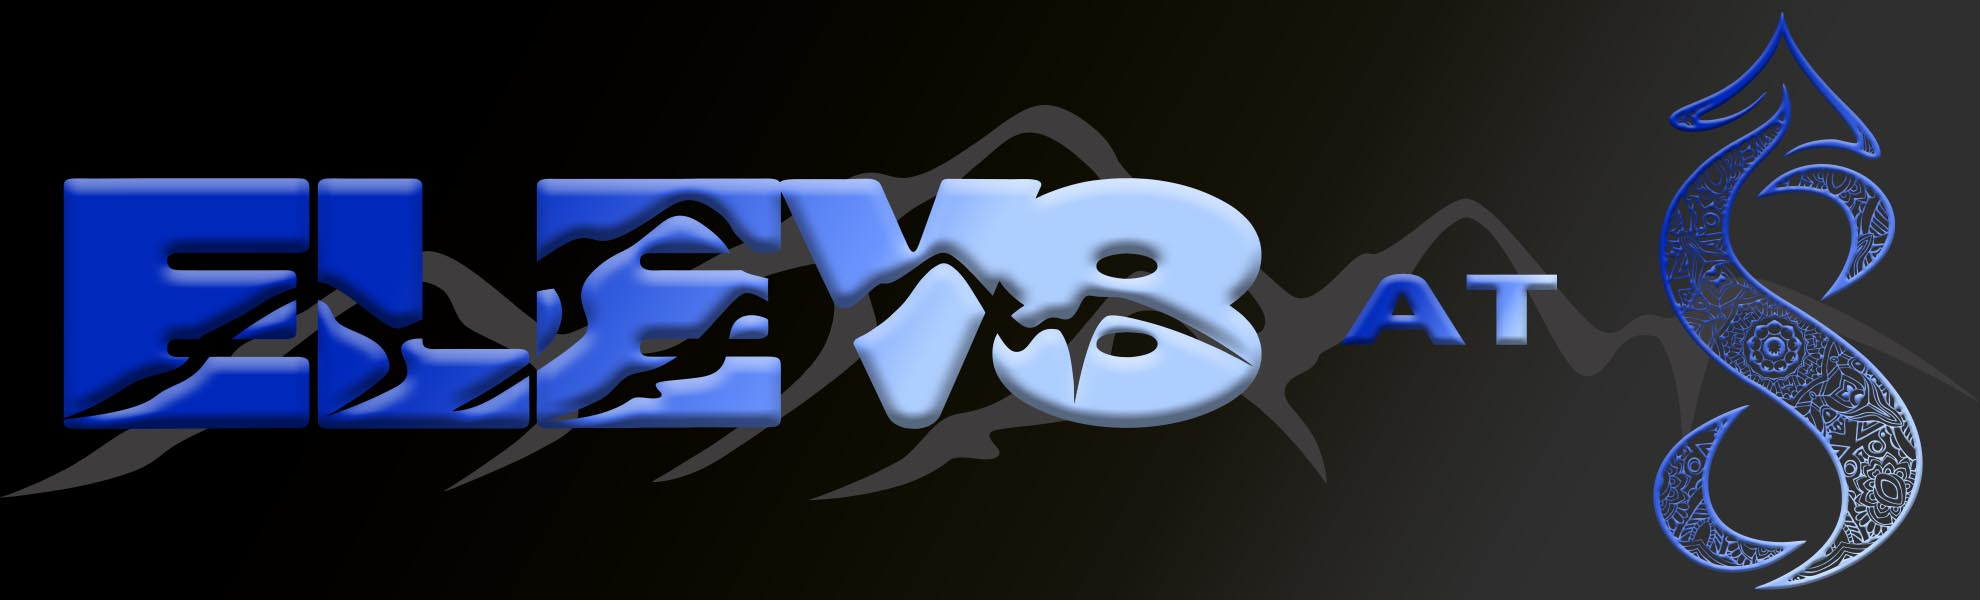 elev8-at-8-banner.jpg